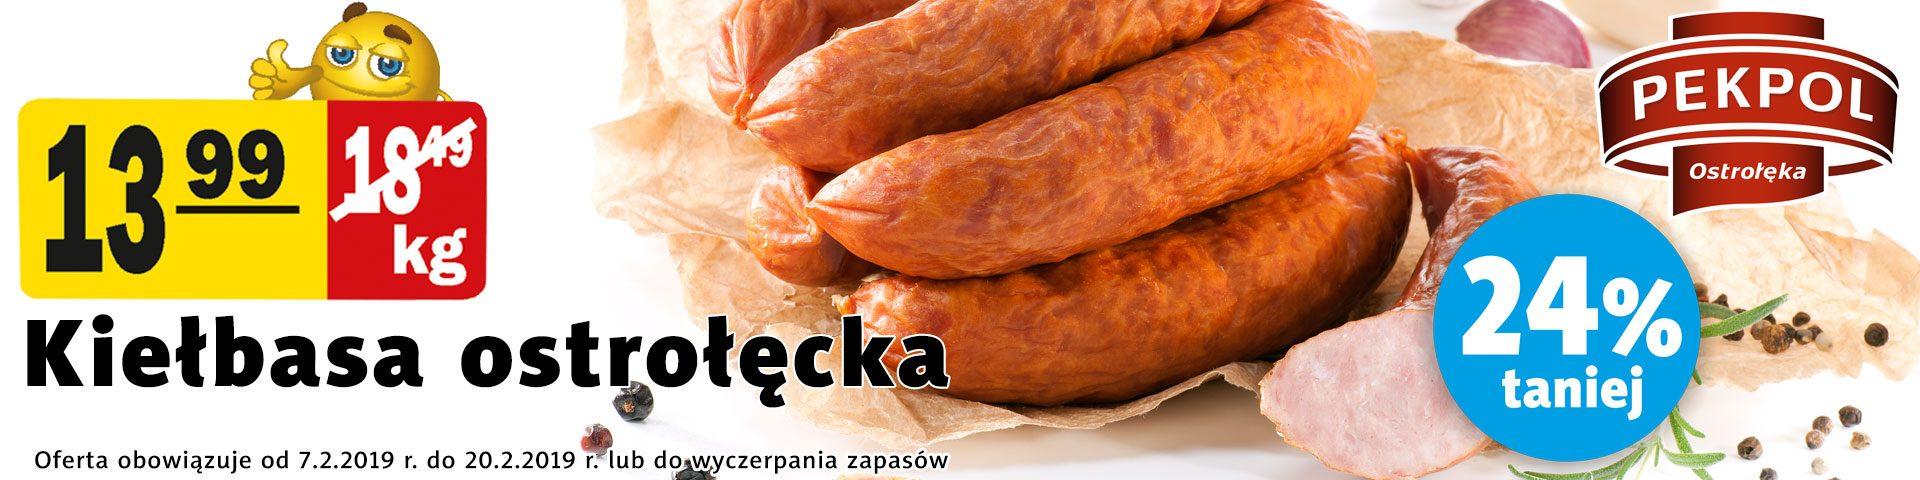 7-20.02.2019_kielbasa_ostrolecka